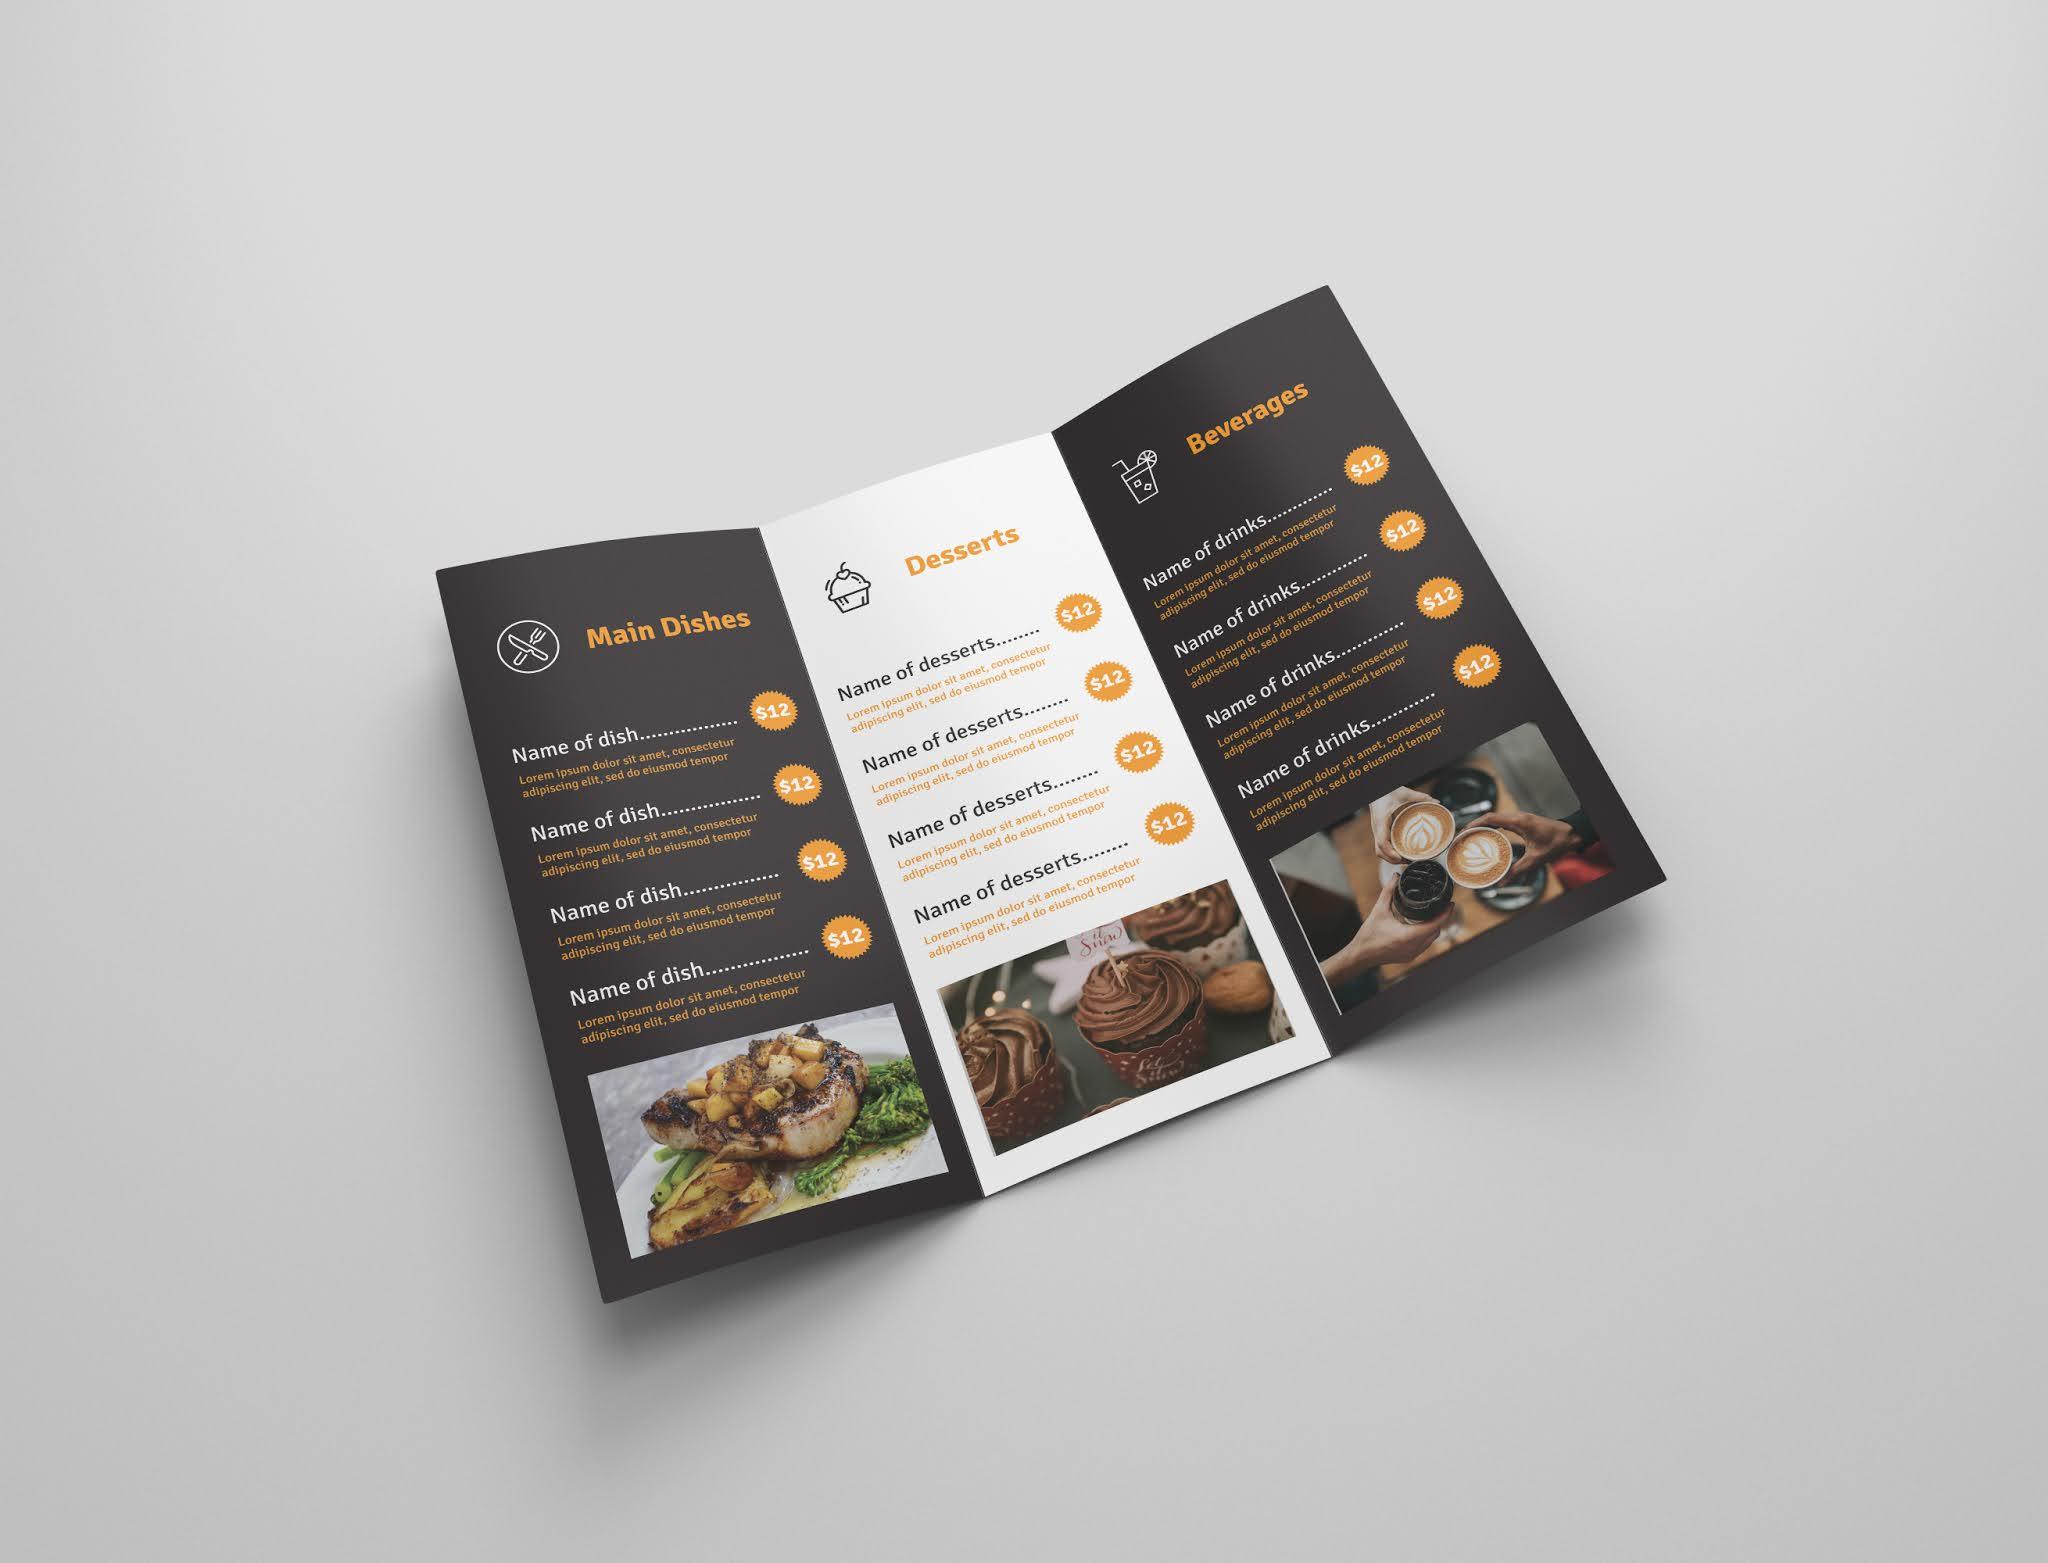 Download free food brochure psd, free food menu psd, free download 1